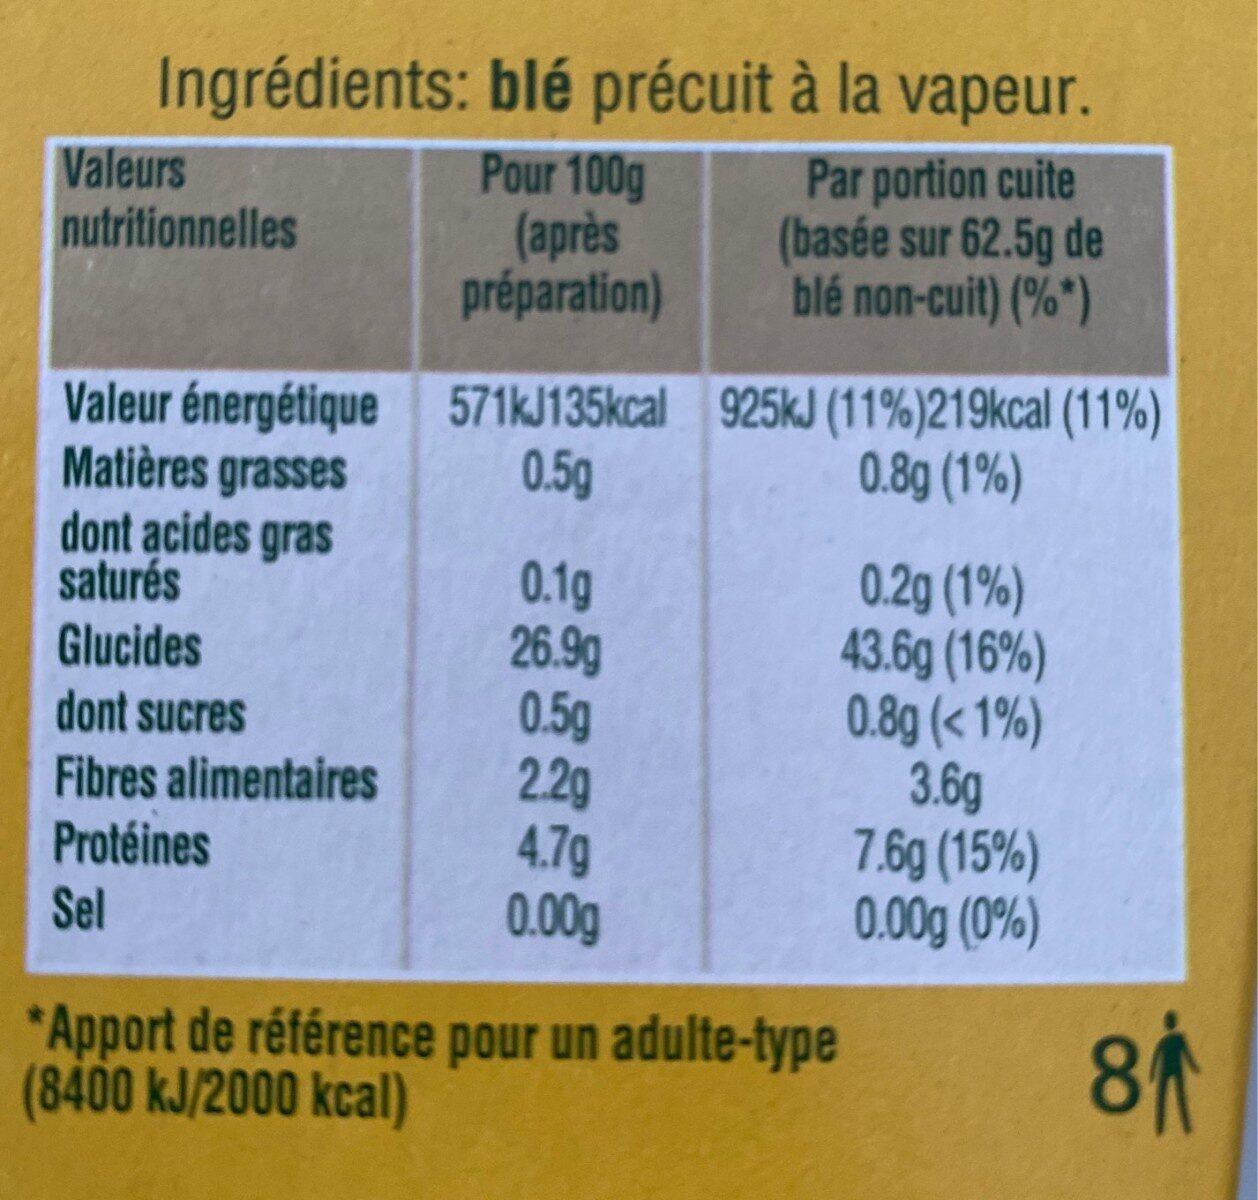 Blé cuisson 10 min Ebly 4 x 125 g - Nutrition facts - fr